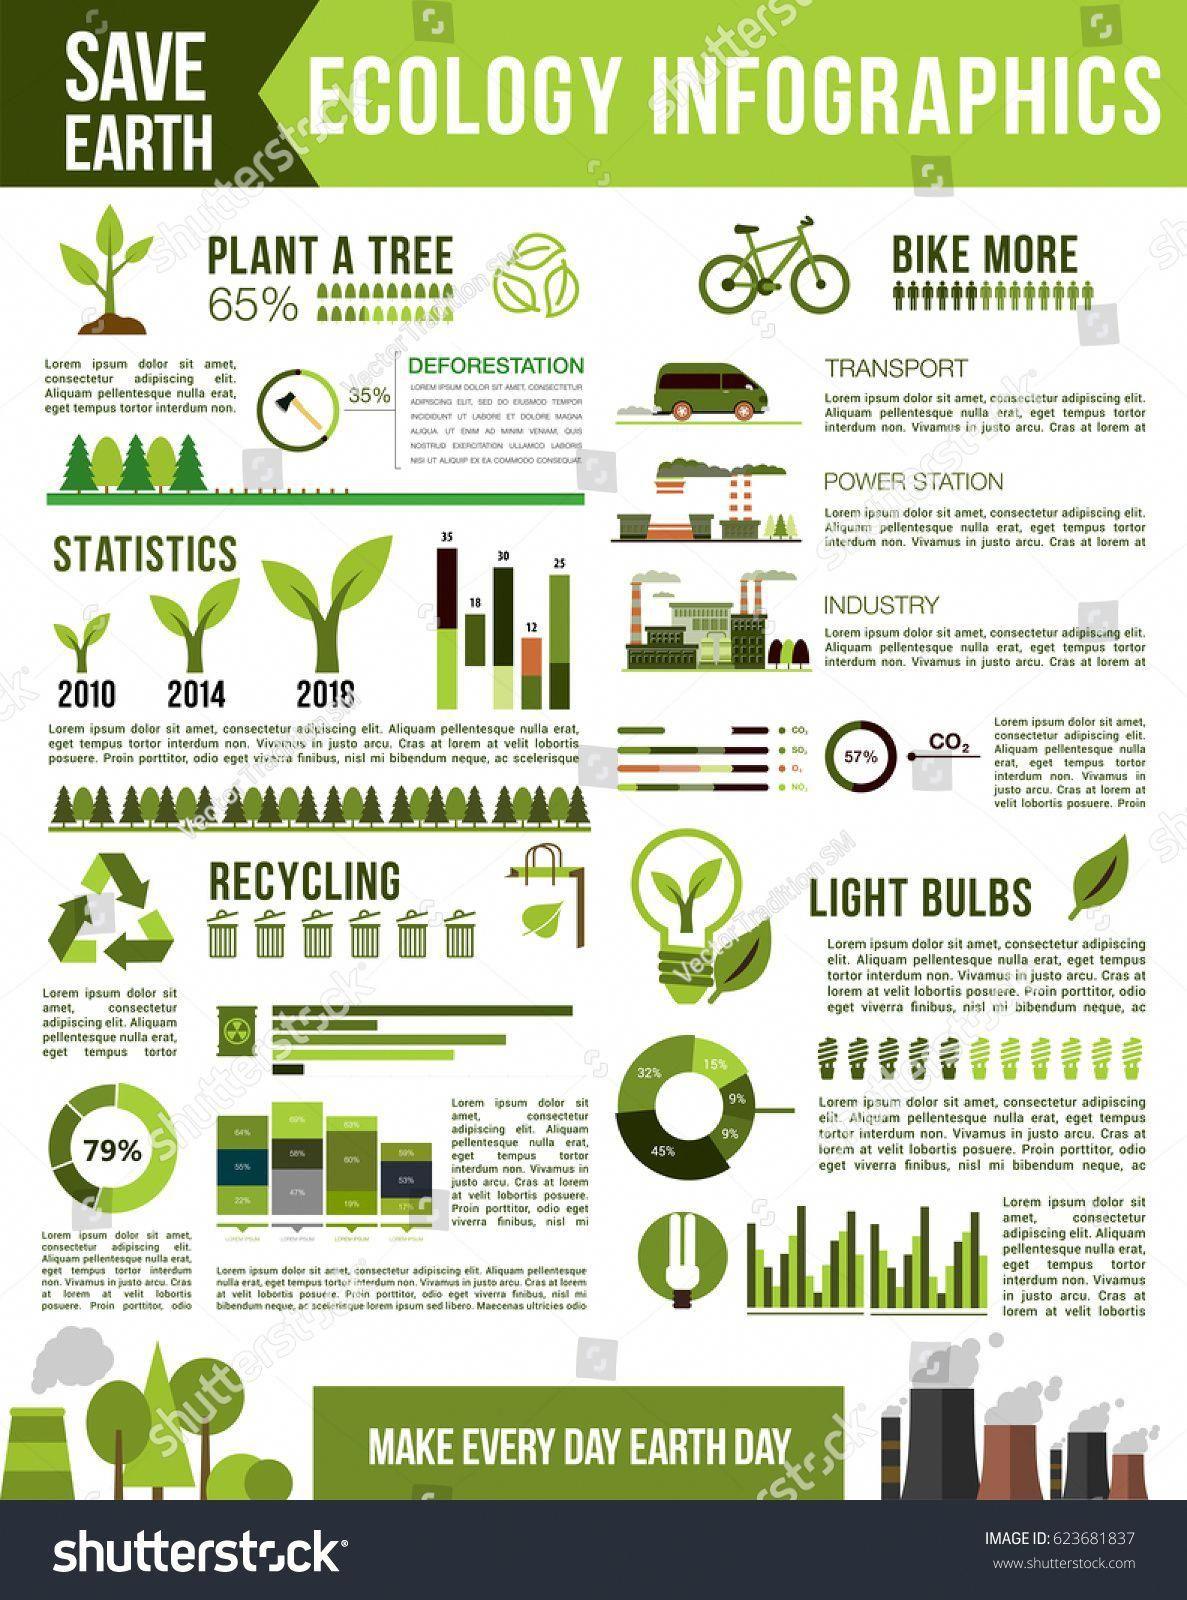 InfographicsOnSocialMedia InfographicsDesign